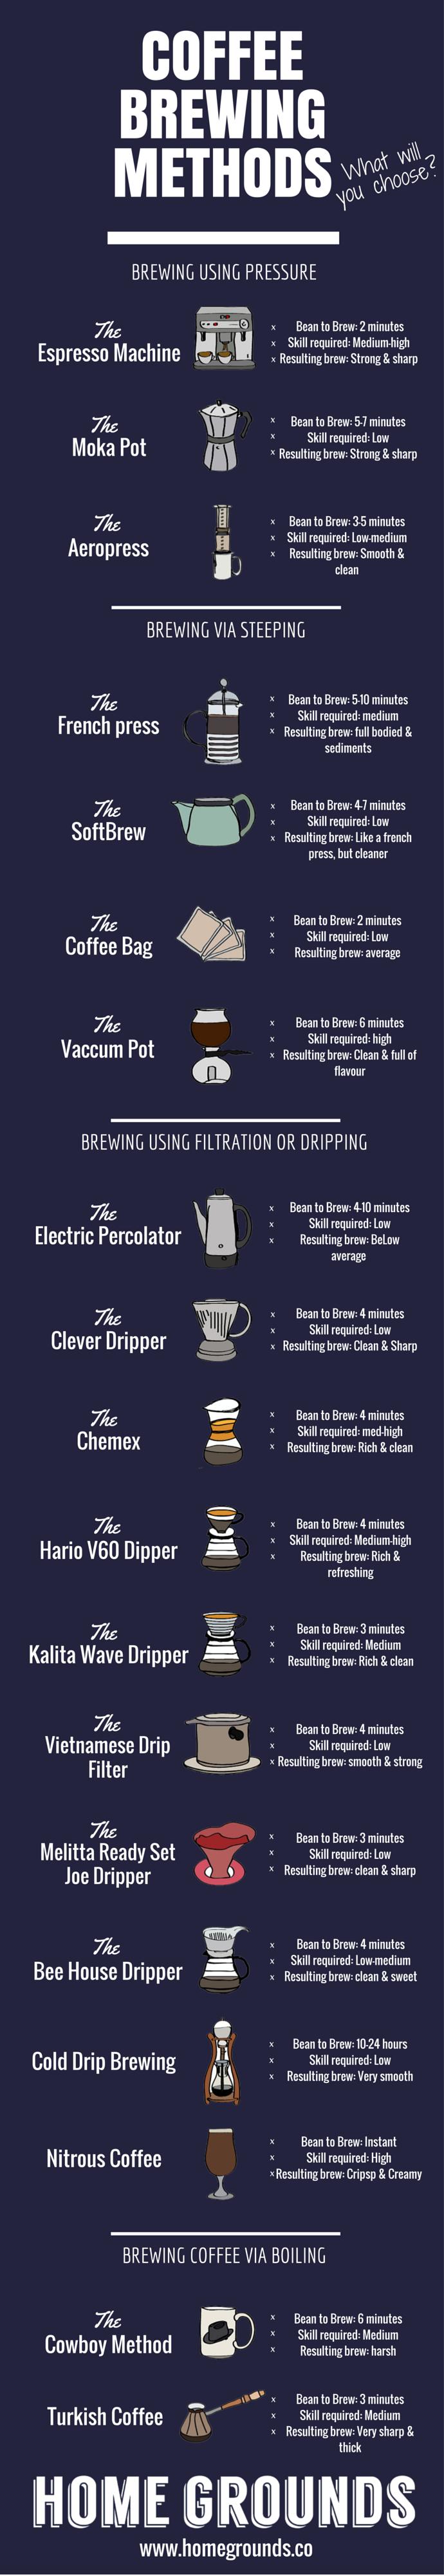 Coffee Brewing Methods 19 Ways To Brew Amazing Coffee Resep Kopi Pecinta Kopi Dan Kopi Arabika